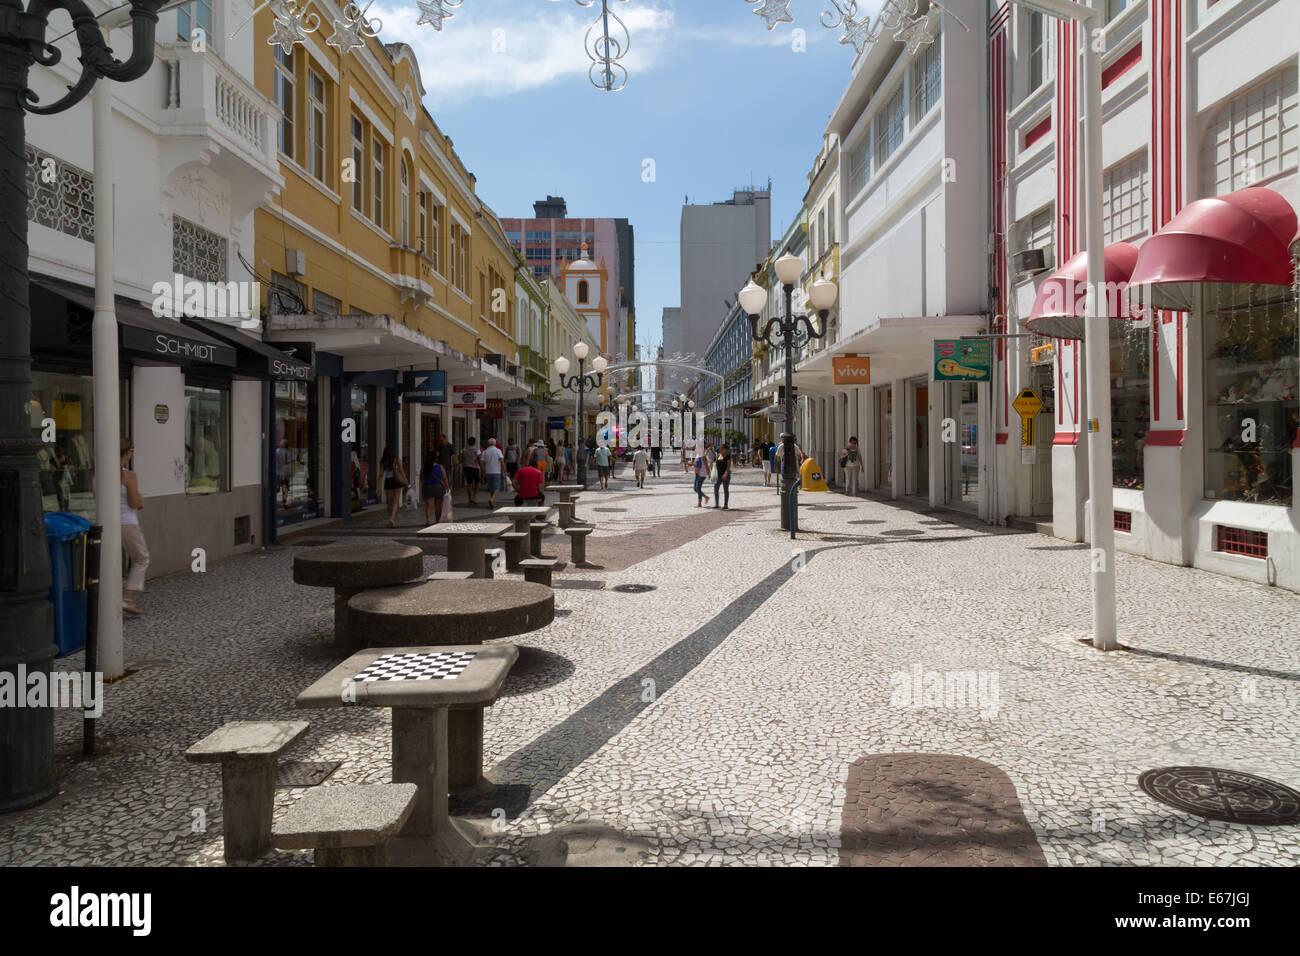 Rua Felipe Schmidt, the main pedestrian street in Florianopolis historic city center. Santa Catarina, Brazil - Stock Image